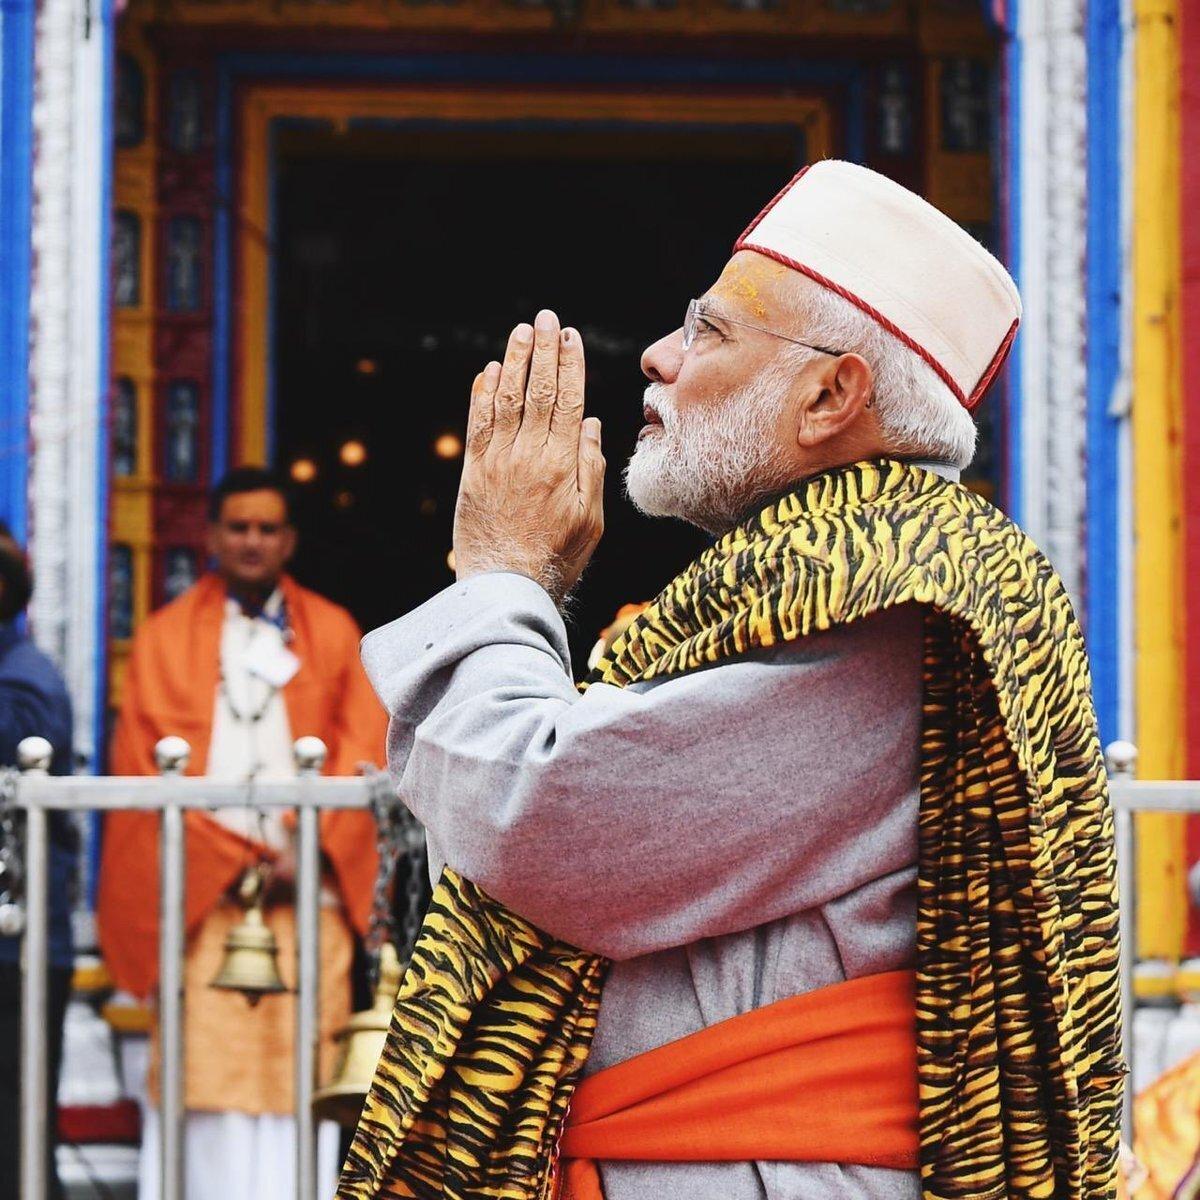 Narendra Modi's Kedarnath Yatra Violates Model Code Of Conduct: